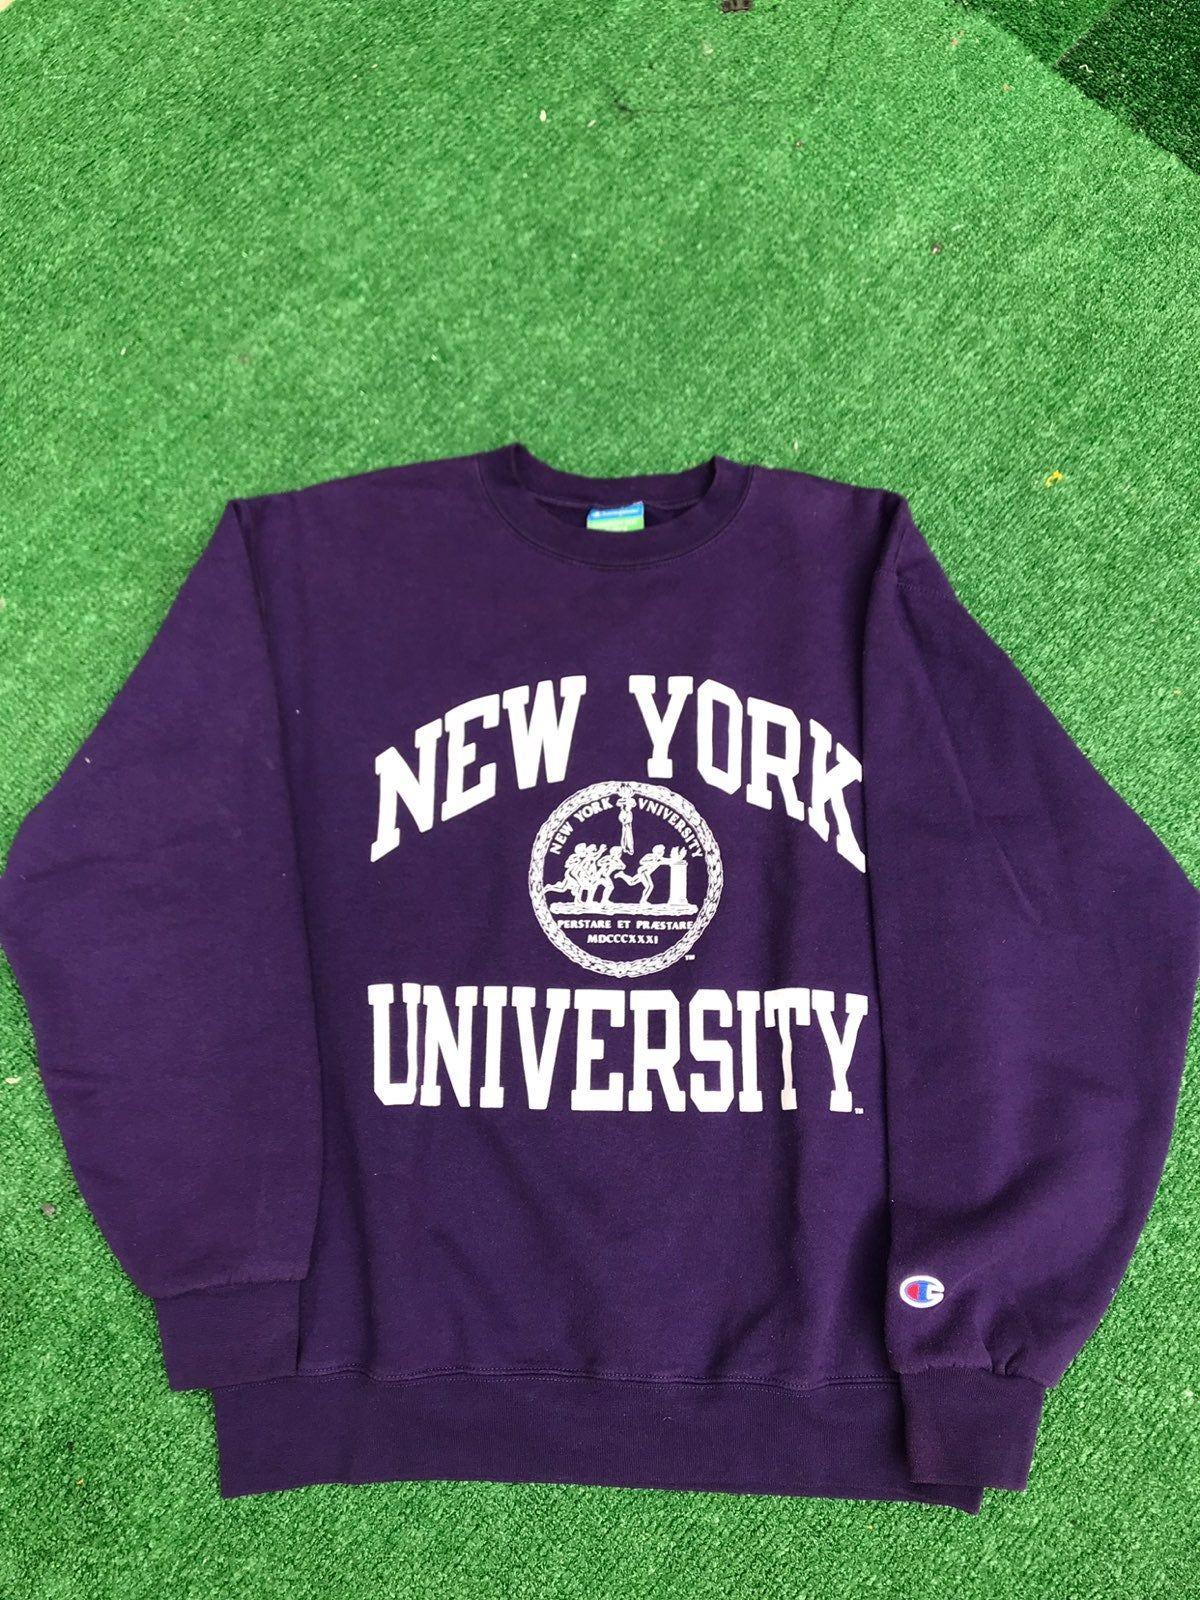 Nyu Champion Crewneck Sweatshirt Sweatshirts College Sweatshirts Hoodie Nyu Sweatshirt [ 1600 x 1200 Pixel ]